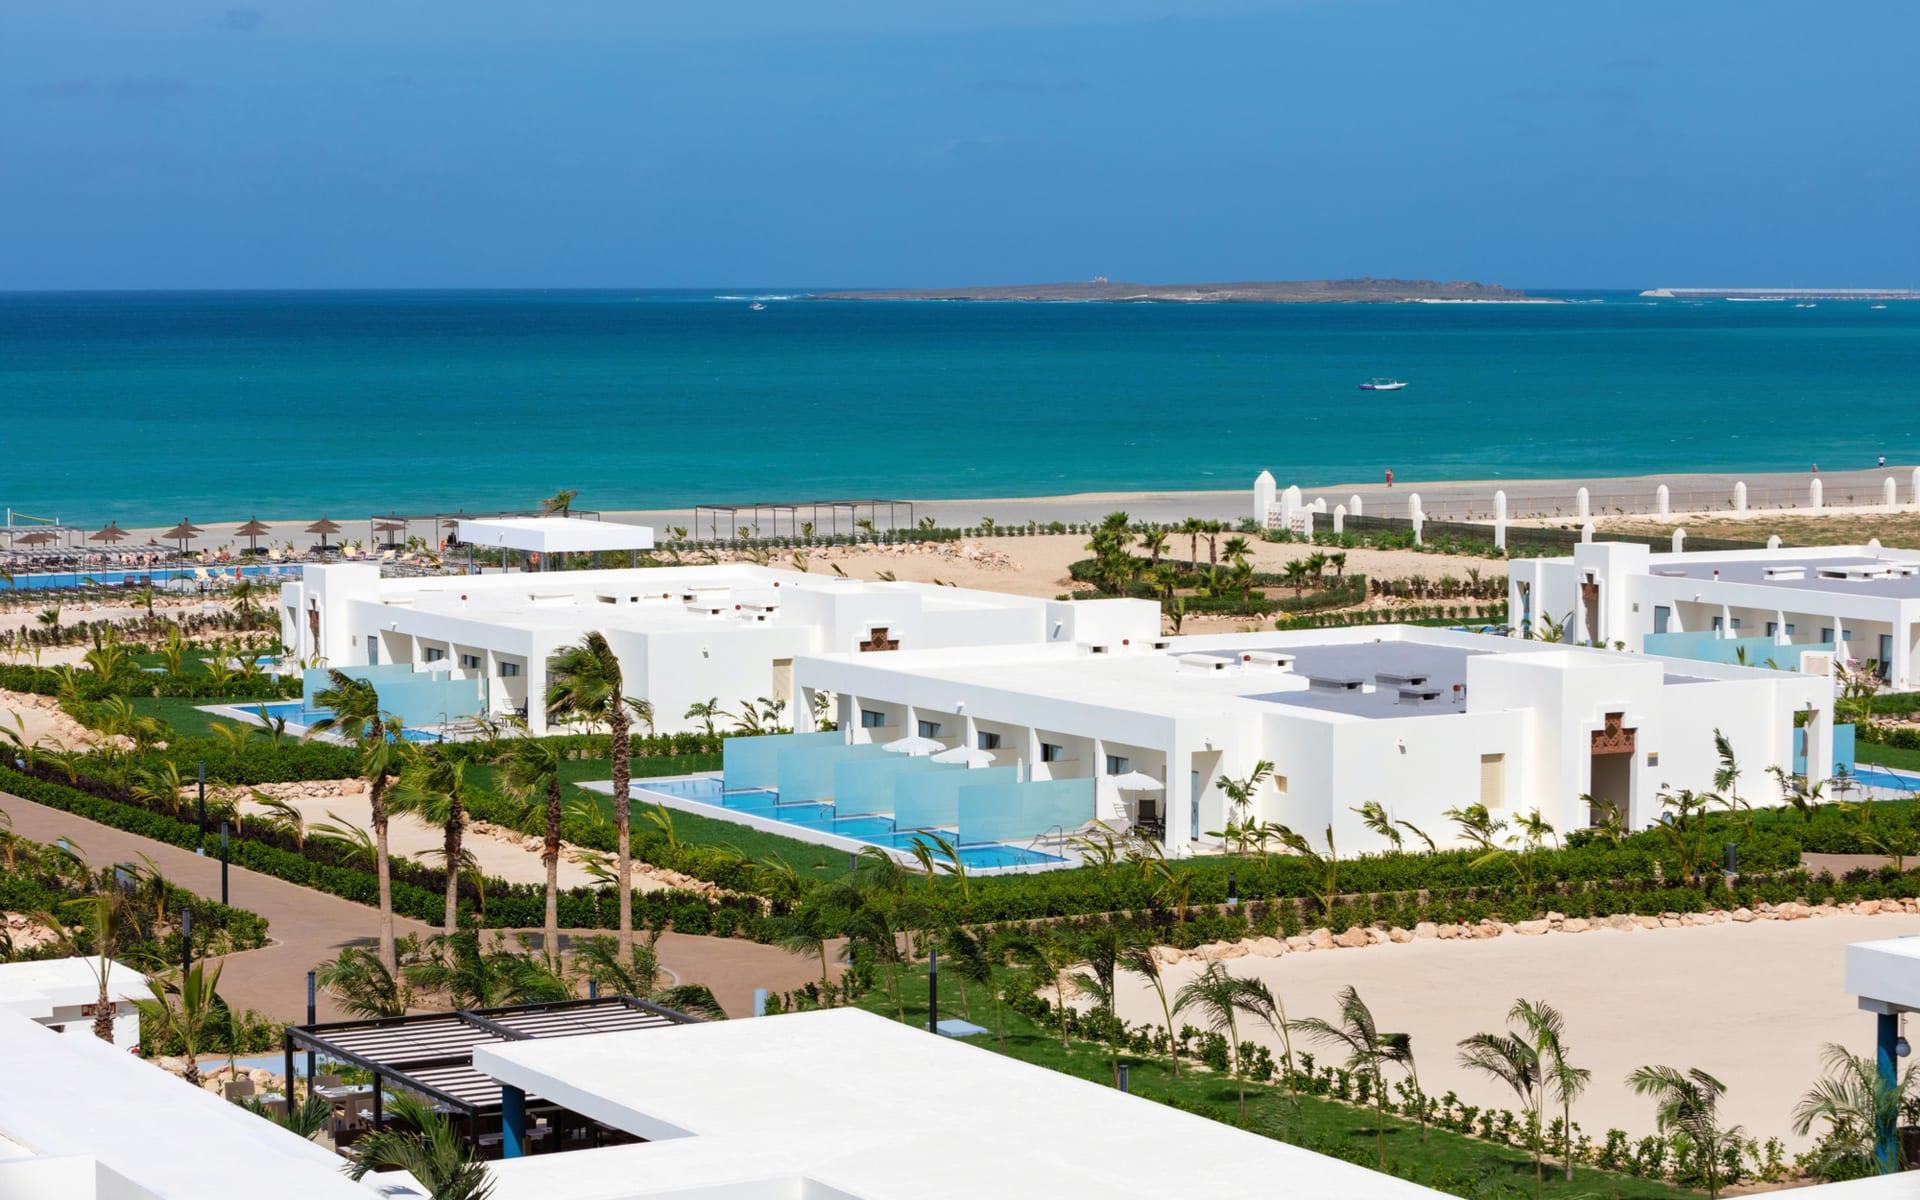 Badeferien im Hotel Riu Palace Boavista ab Praia de Chaves: 5084df02-e539-4c4e-bb92-6aa615f1fb84